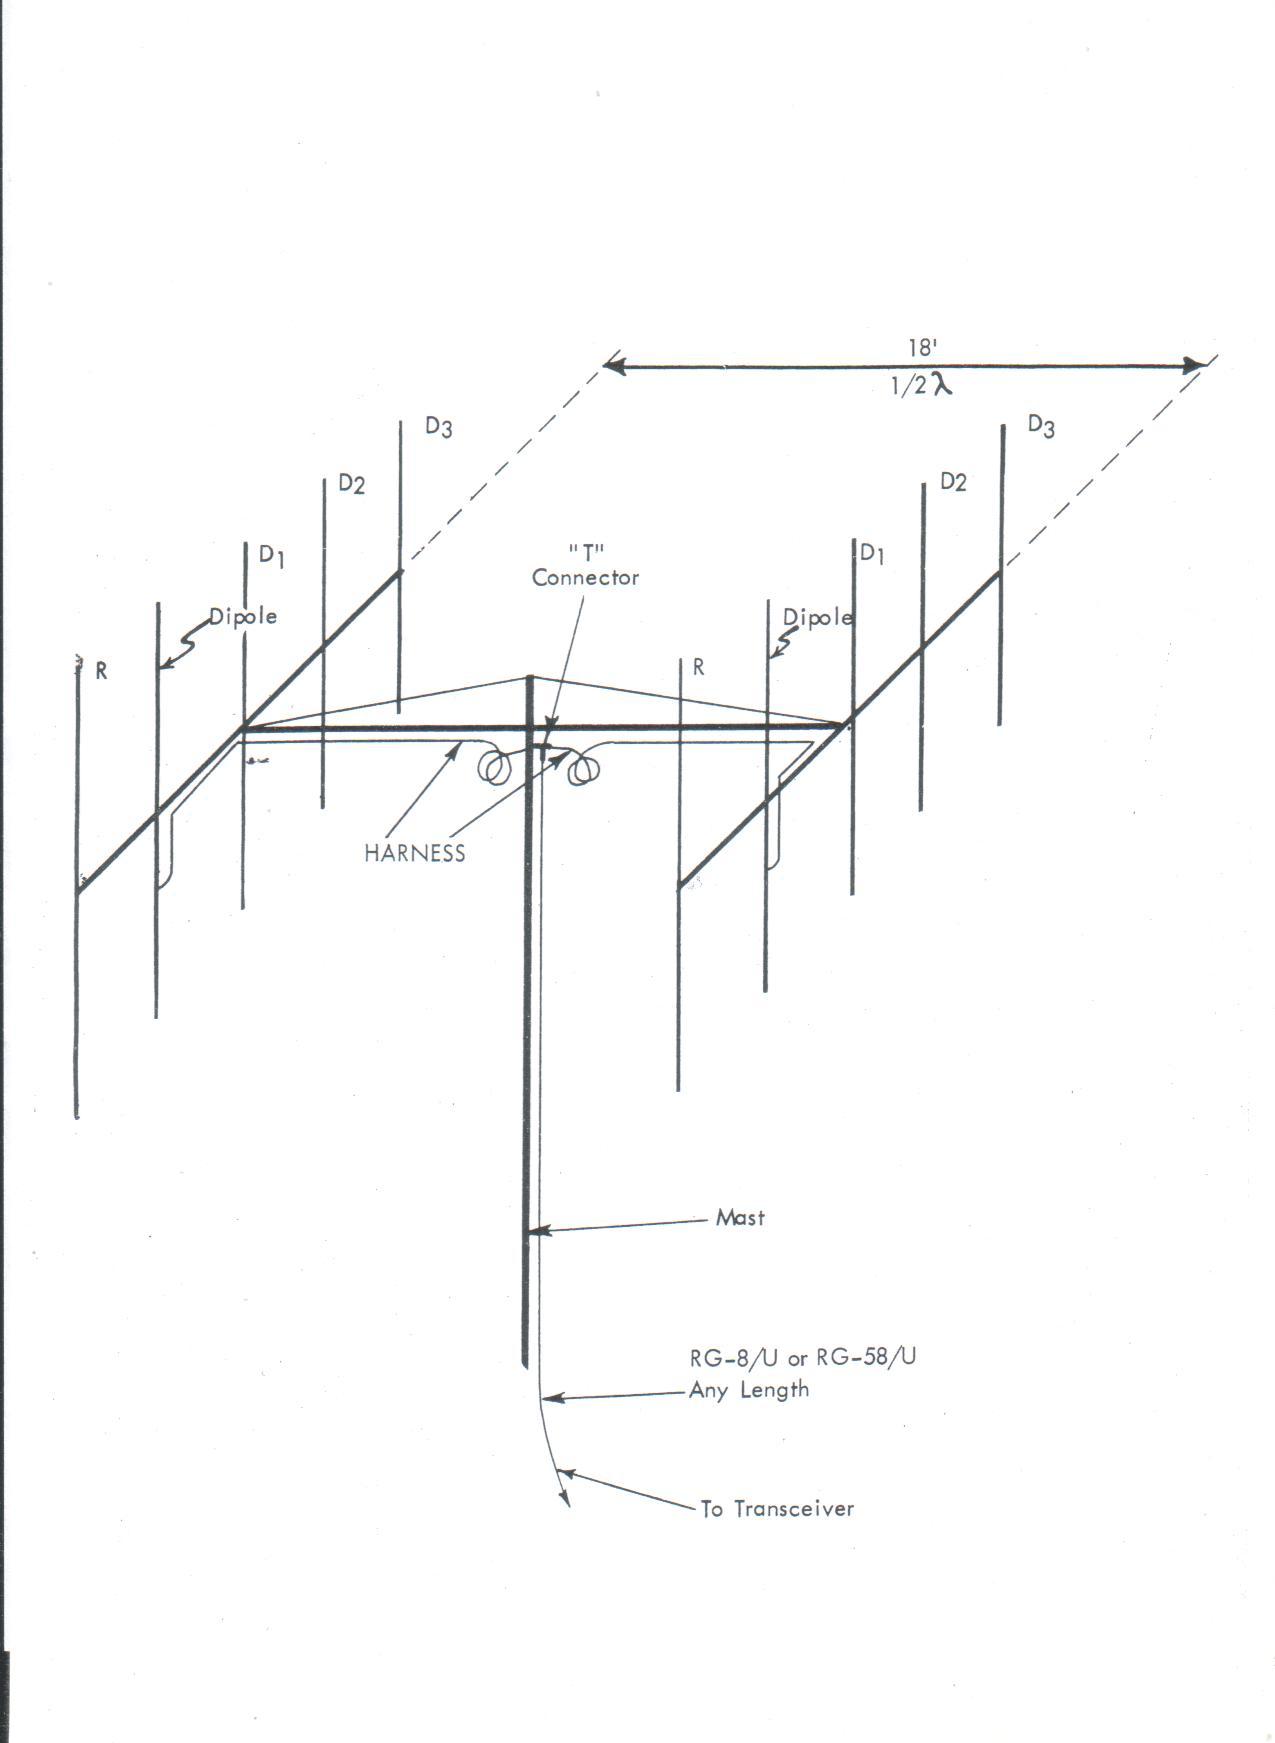 dipole antenna wiring diagram auto electrical wiring diagram zf trans 6070 004 009 related with dipole antenna wiring diagram